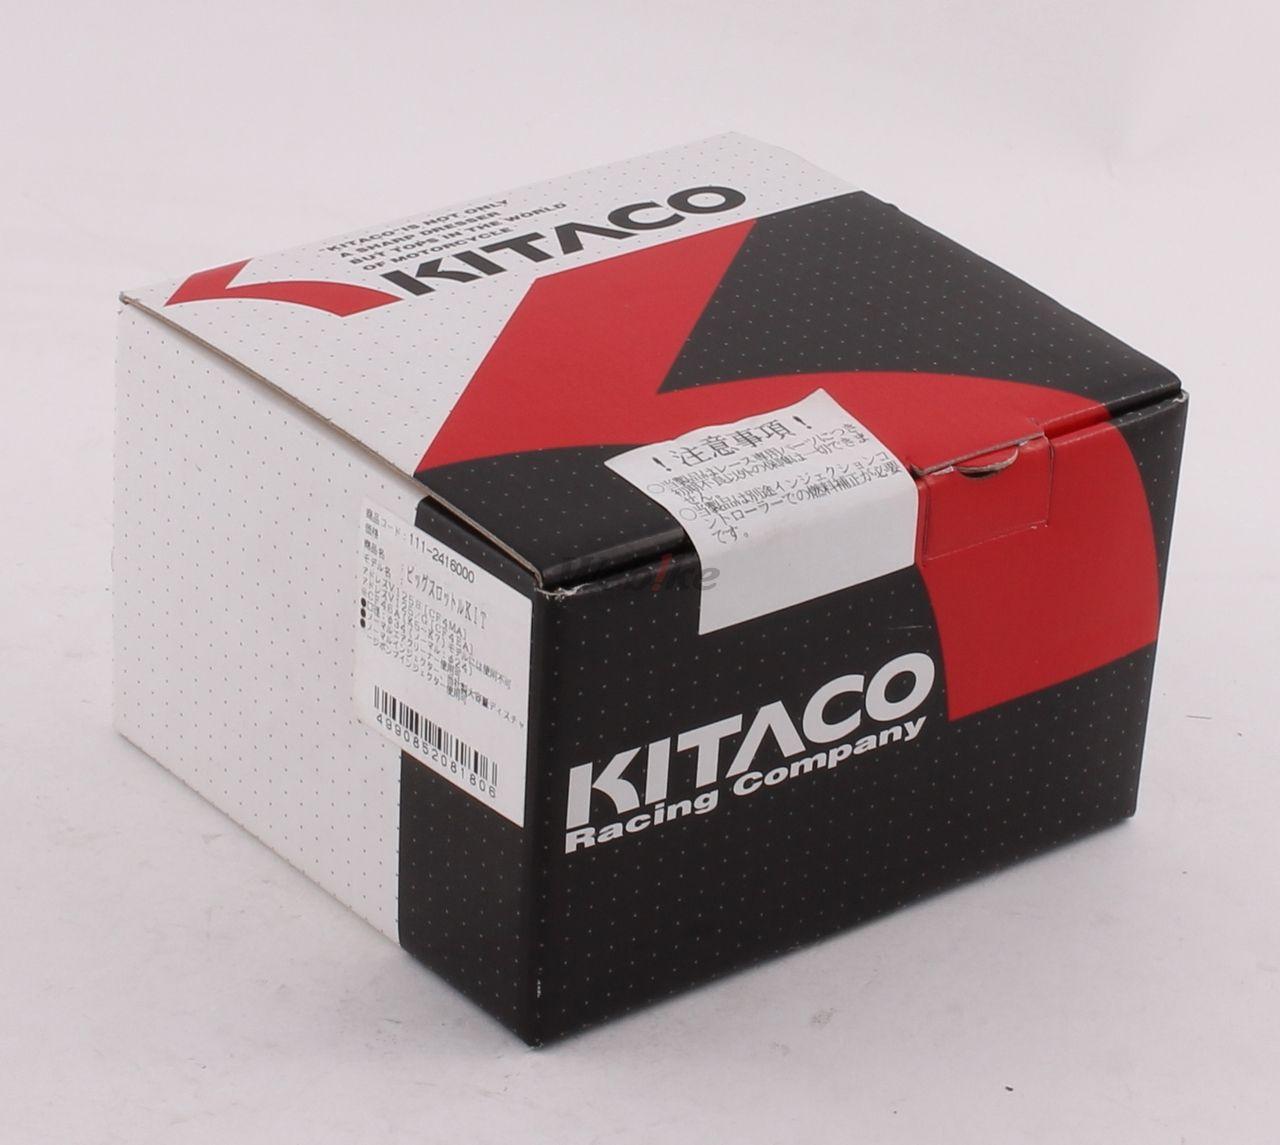 【KITACO】節流閥套件 - 「Webike-摩托百貨」